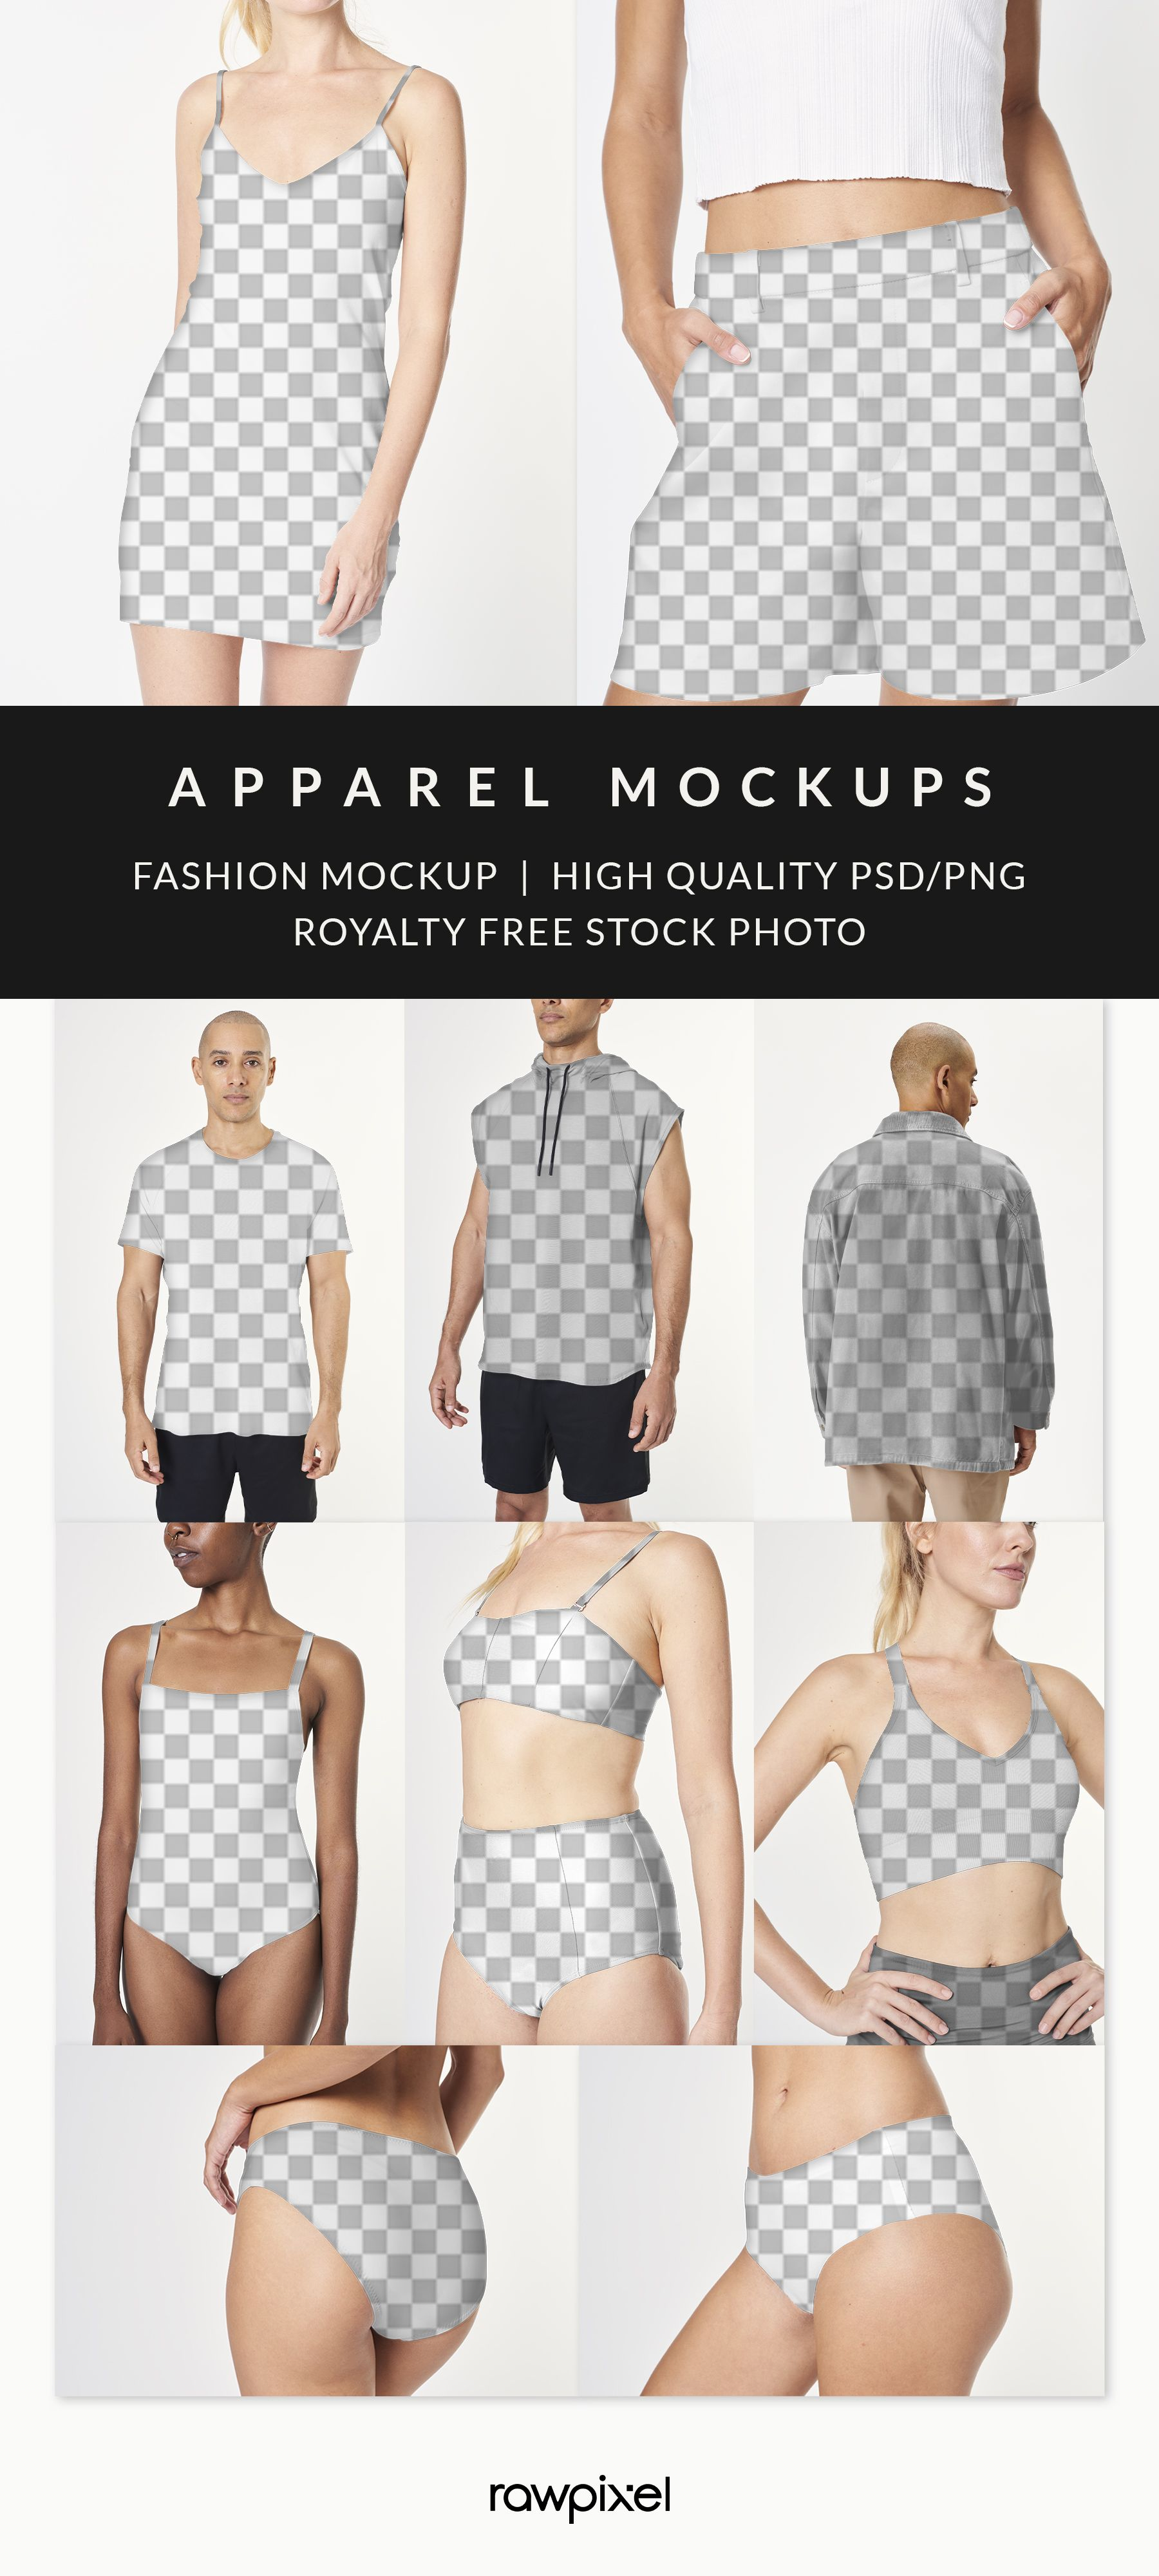 High Resolution People Apparel Fashion Mockups And Stock Photo Png Set Clothing Mockup Fashion Mockup Apparel